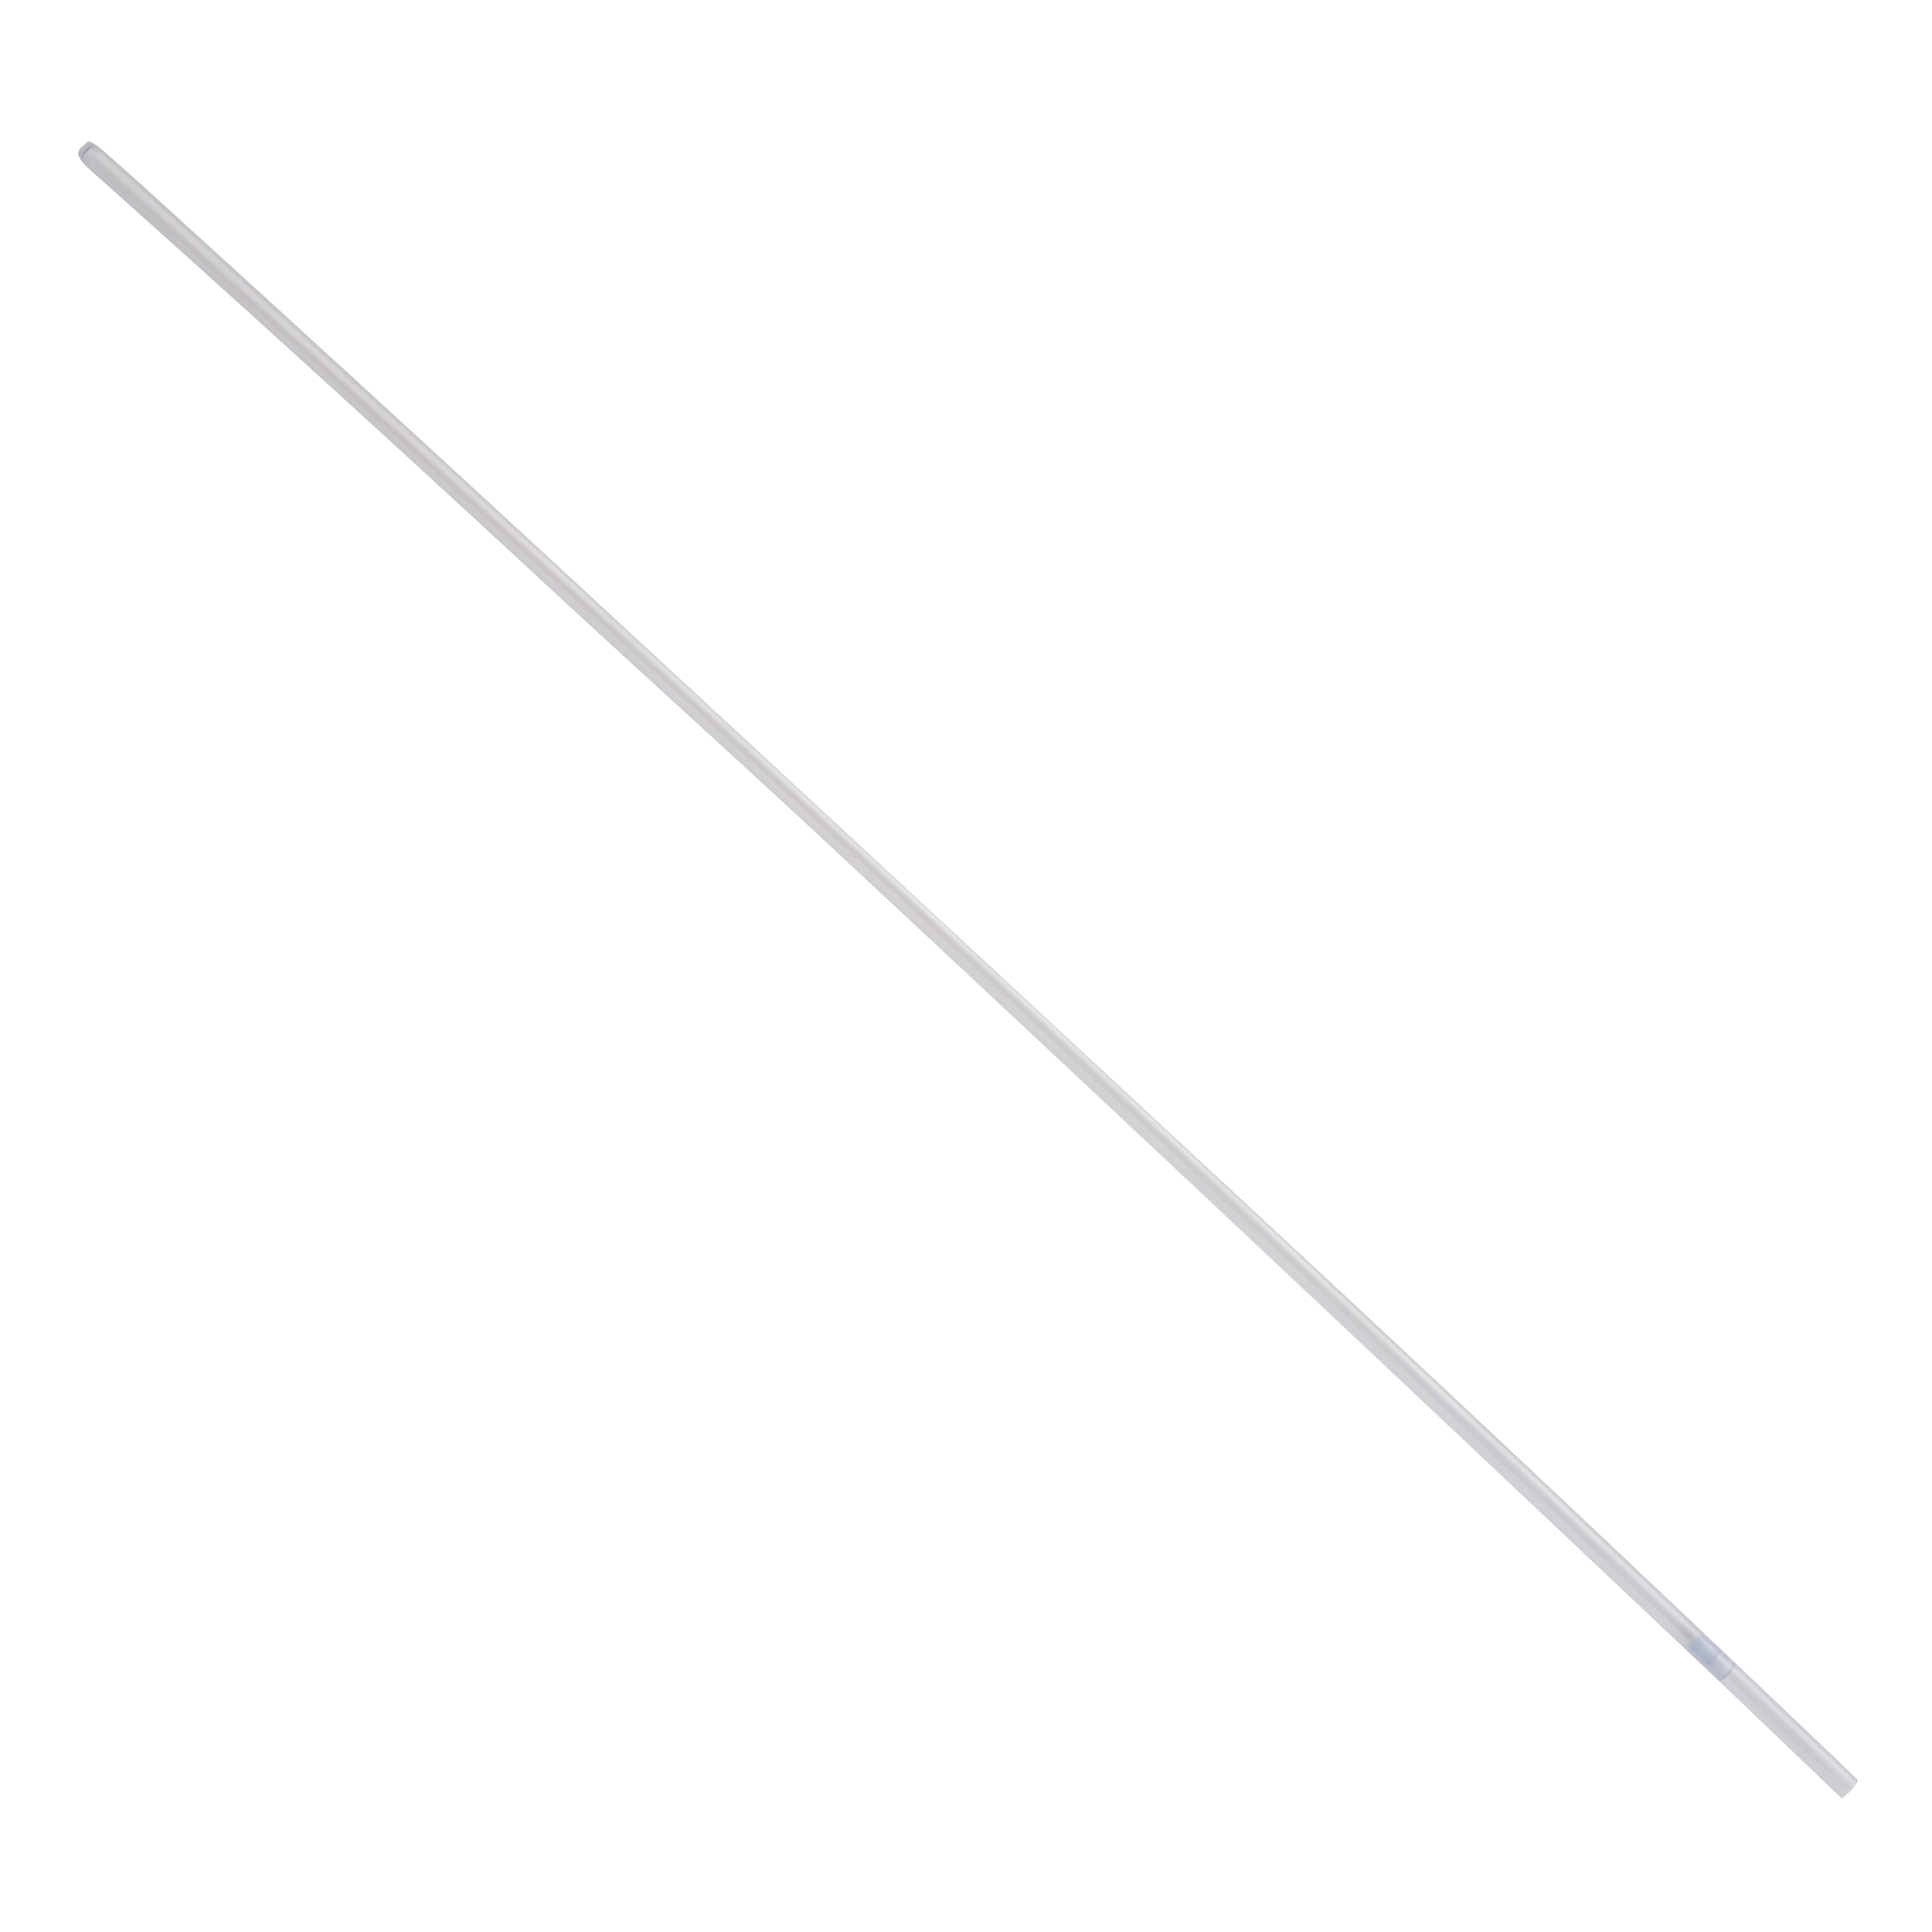 solominka-dlja-katetera-dlja-iskusstvennogo-osemenenija-minitube-vetlikar